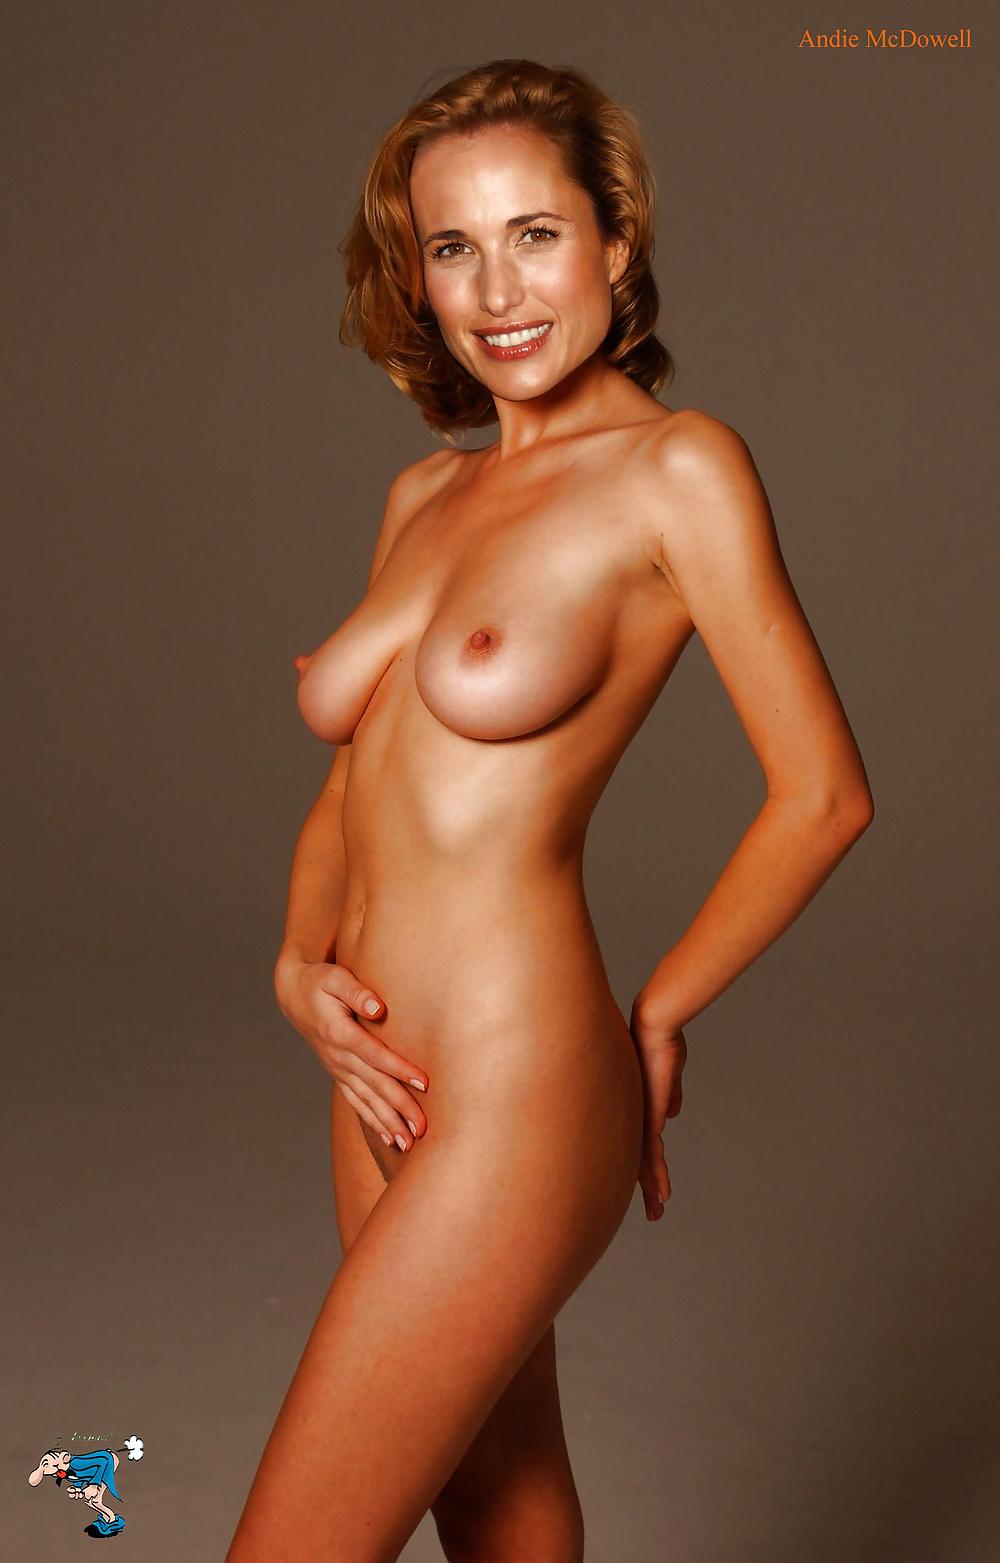 Andie Macdowell Free Nude Celeb Pics